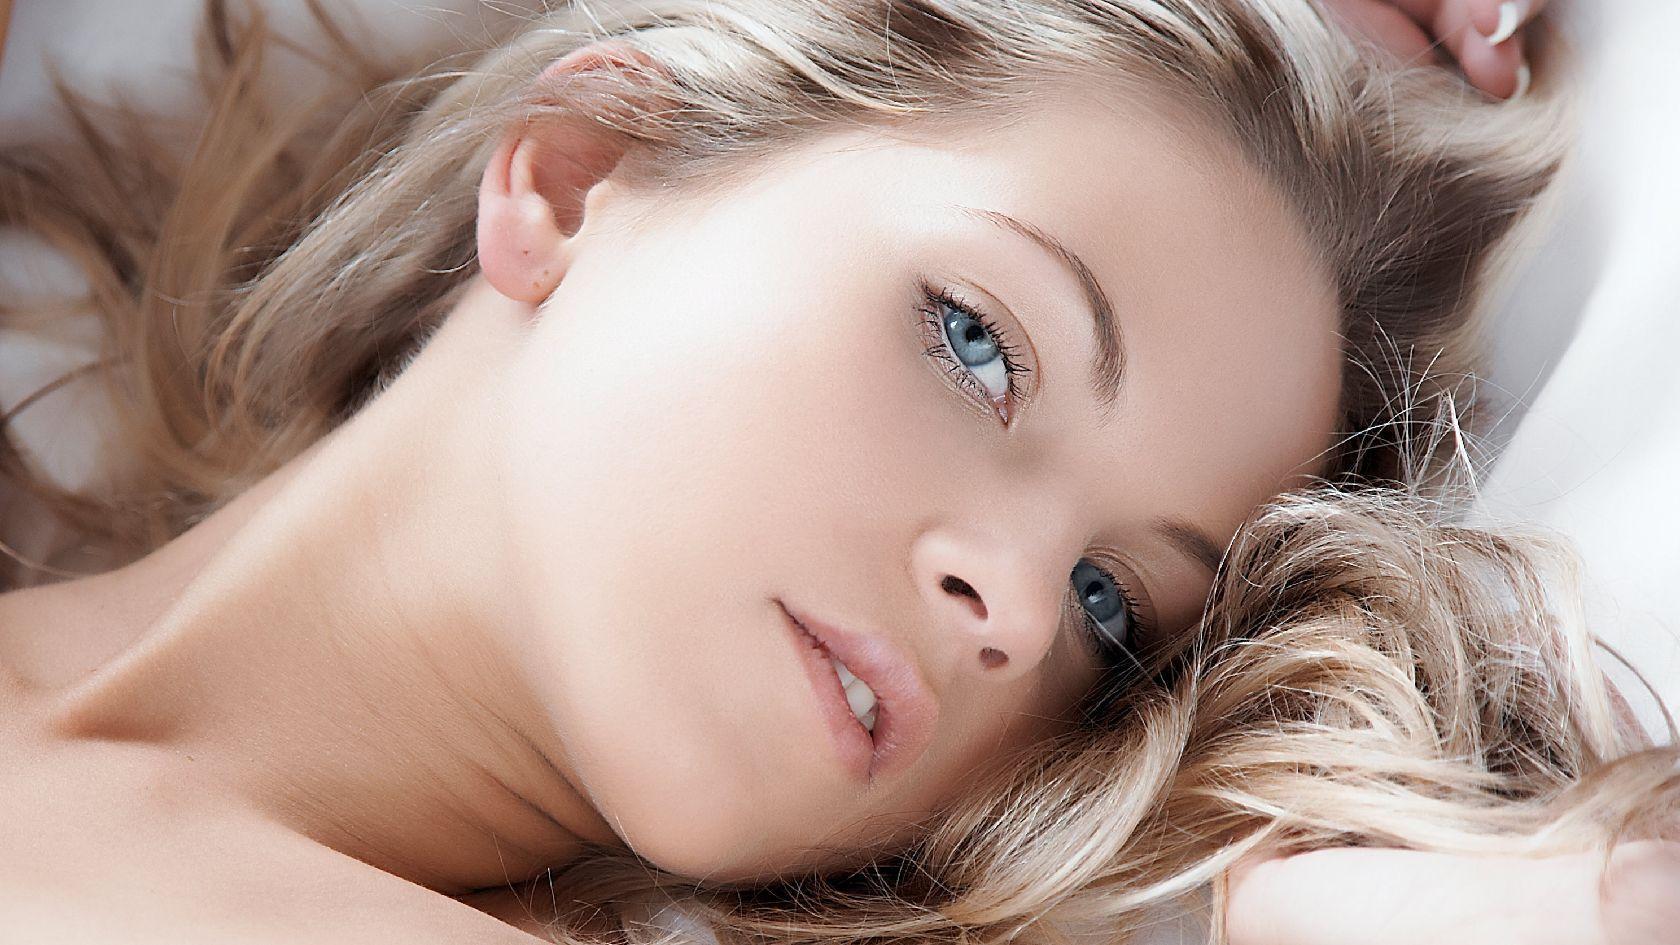 Jenni Gregg, nude model | NUDE Models | Pinterest | Greggs